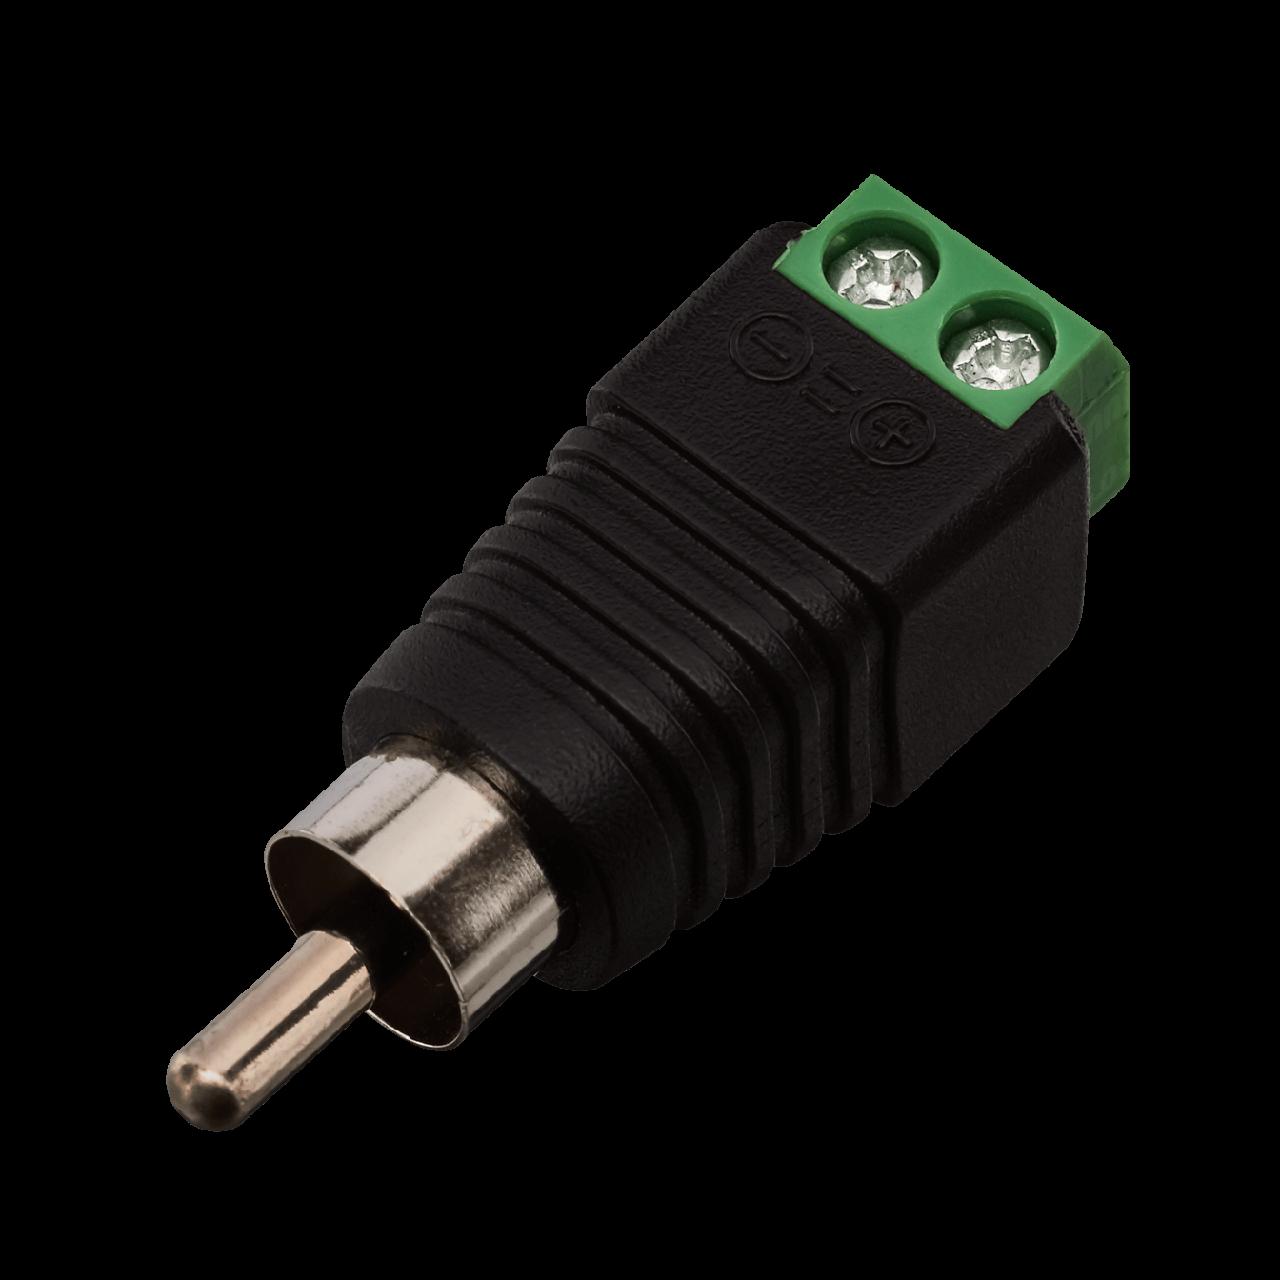 Коннектор GV RCA /M (male)  ФАС 3573 (1 уп = 10шт)